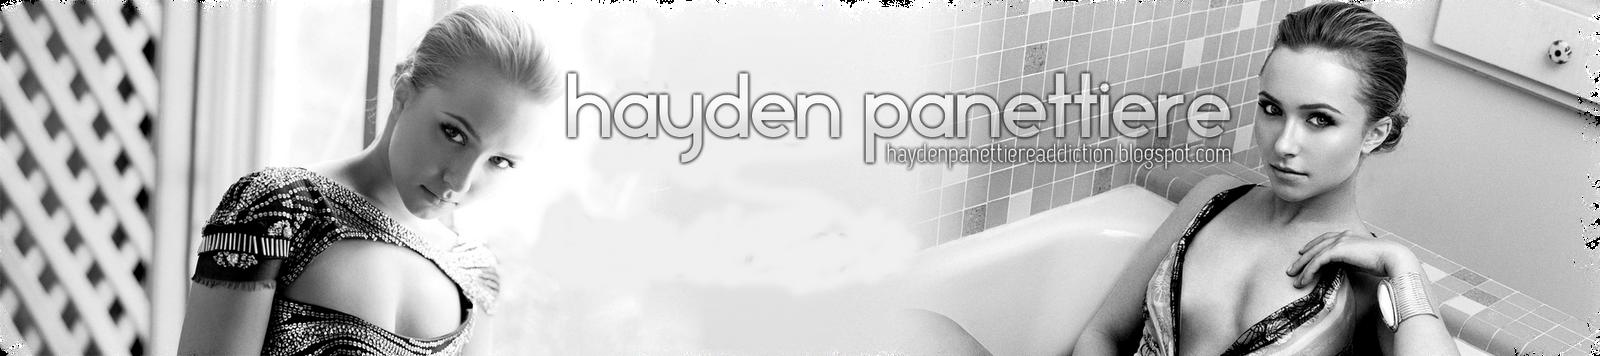 Hayden Panettiere Nashville Promo HD Free Wallpapers - hayden panettiere nashville promo wallpapers